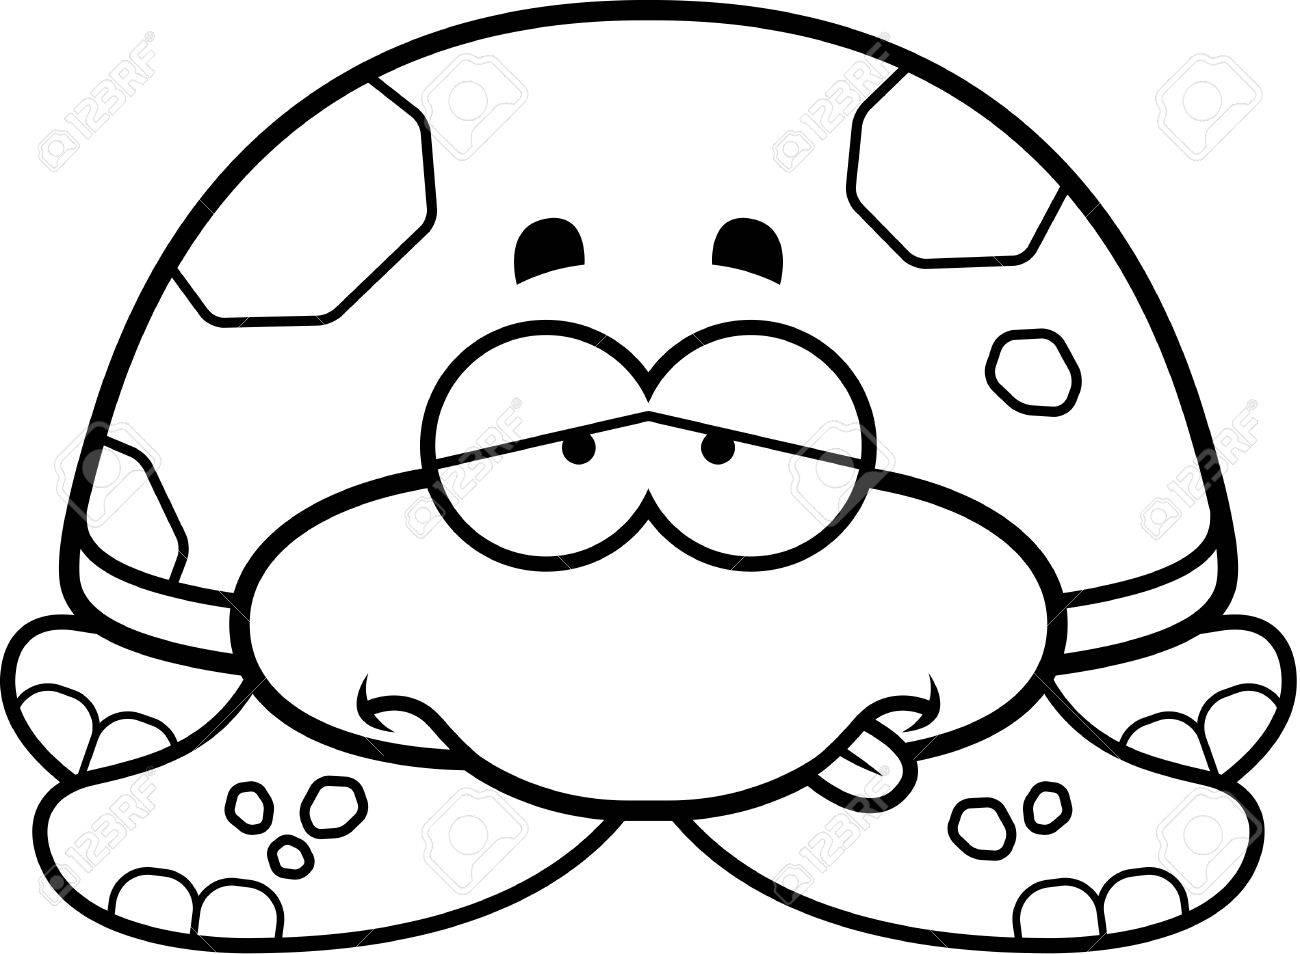 A Cartoon Illustration Of A Little Sea Turtle Looking Sick